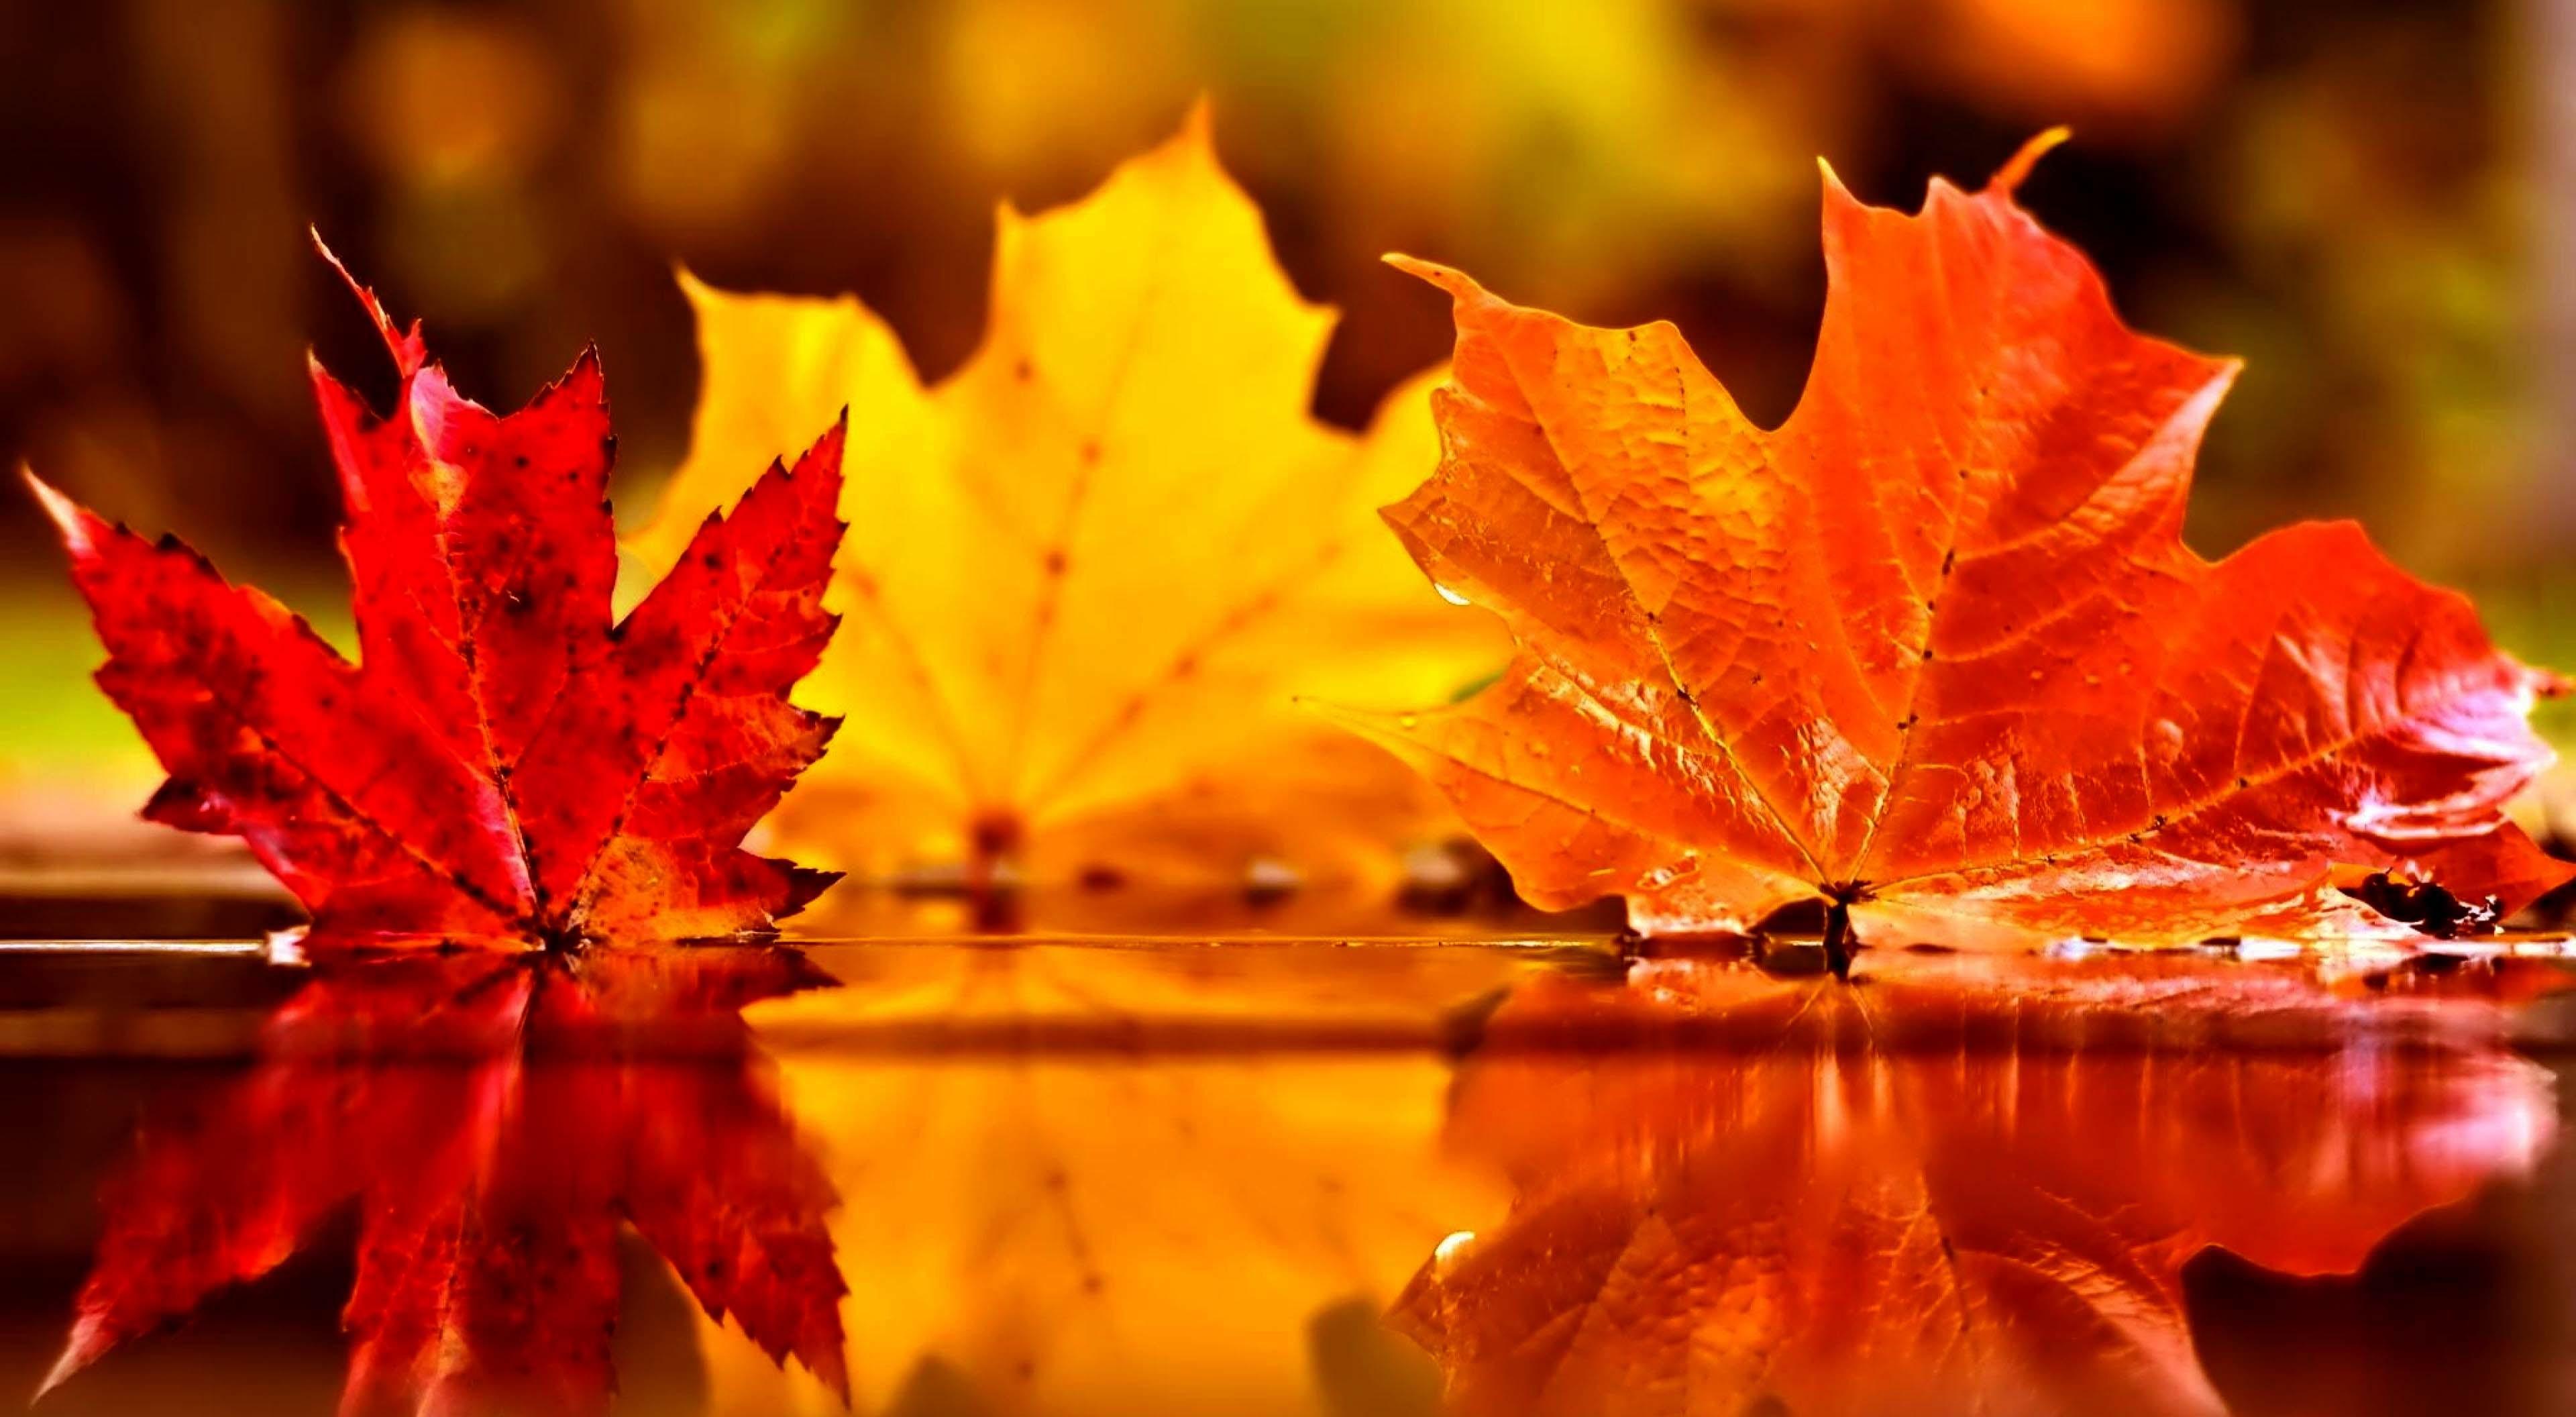 Fall Pumpkin Wallpaper and Screensavers (63+ images)